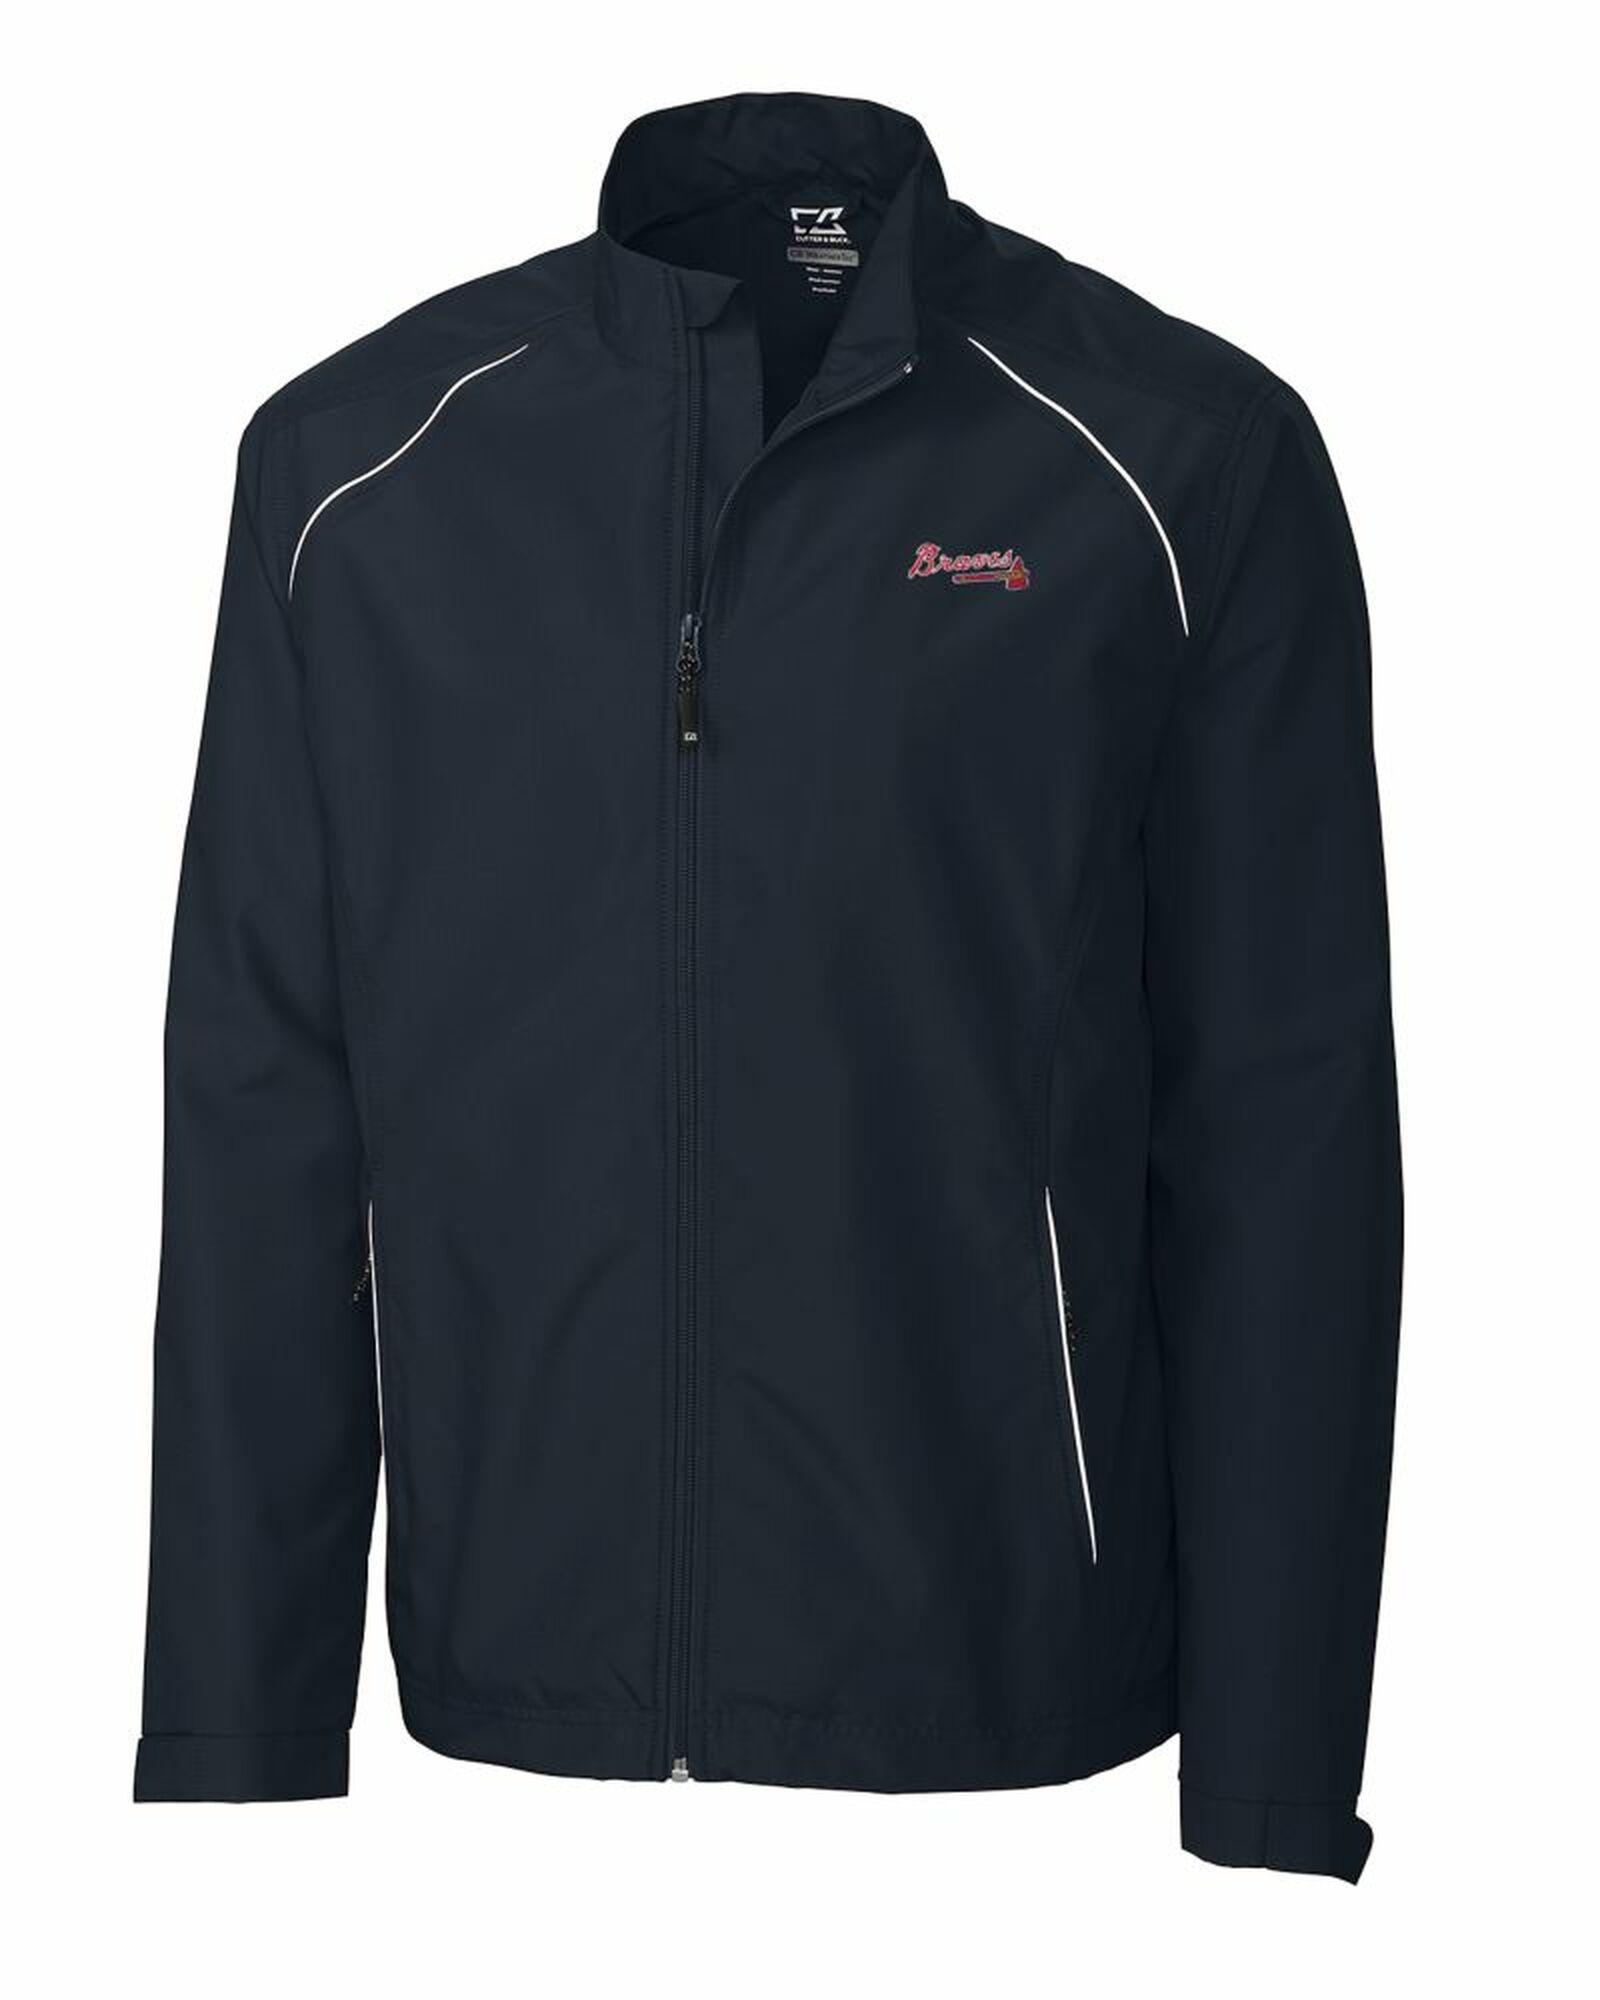 Cutter and Buck Mens Atlanta Braves WeatherTec Beacon Full-Zip Jacket